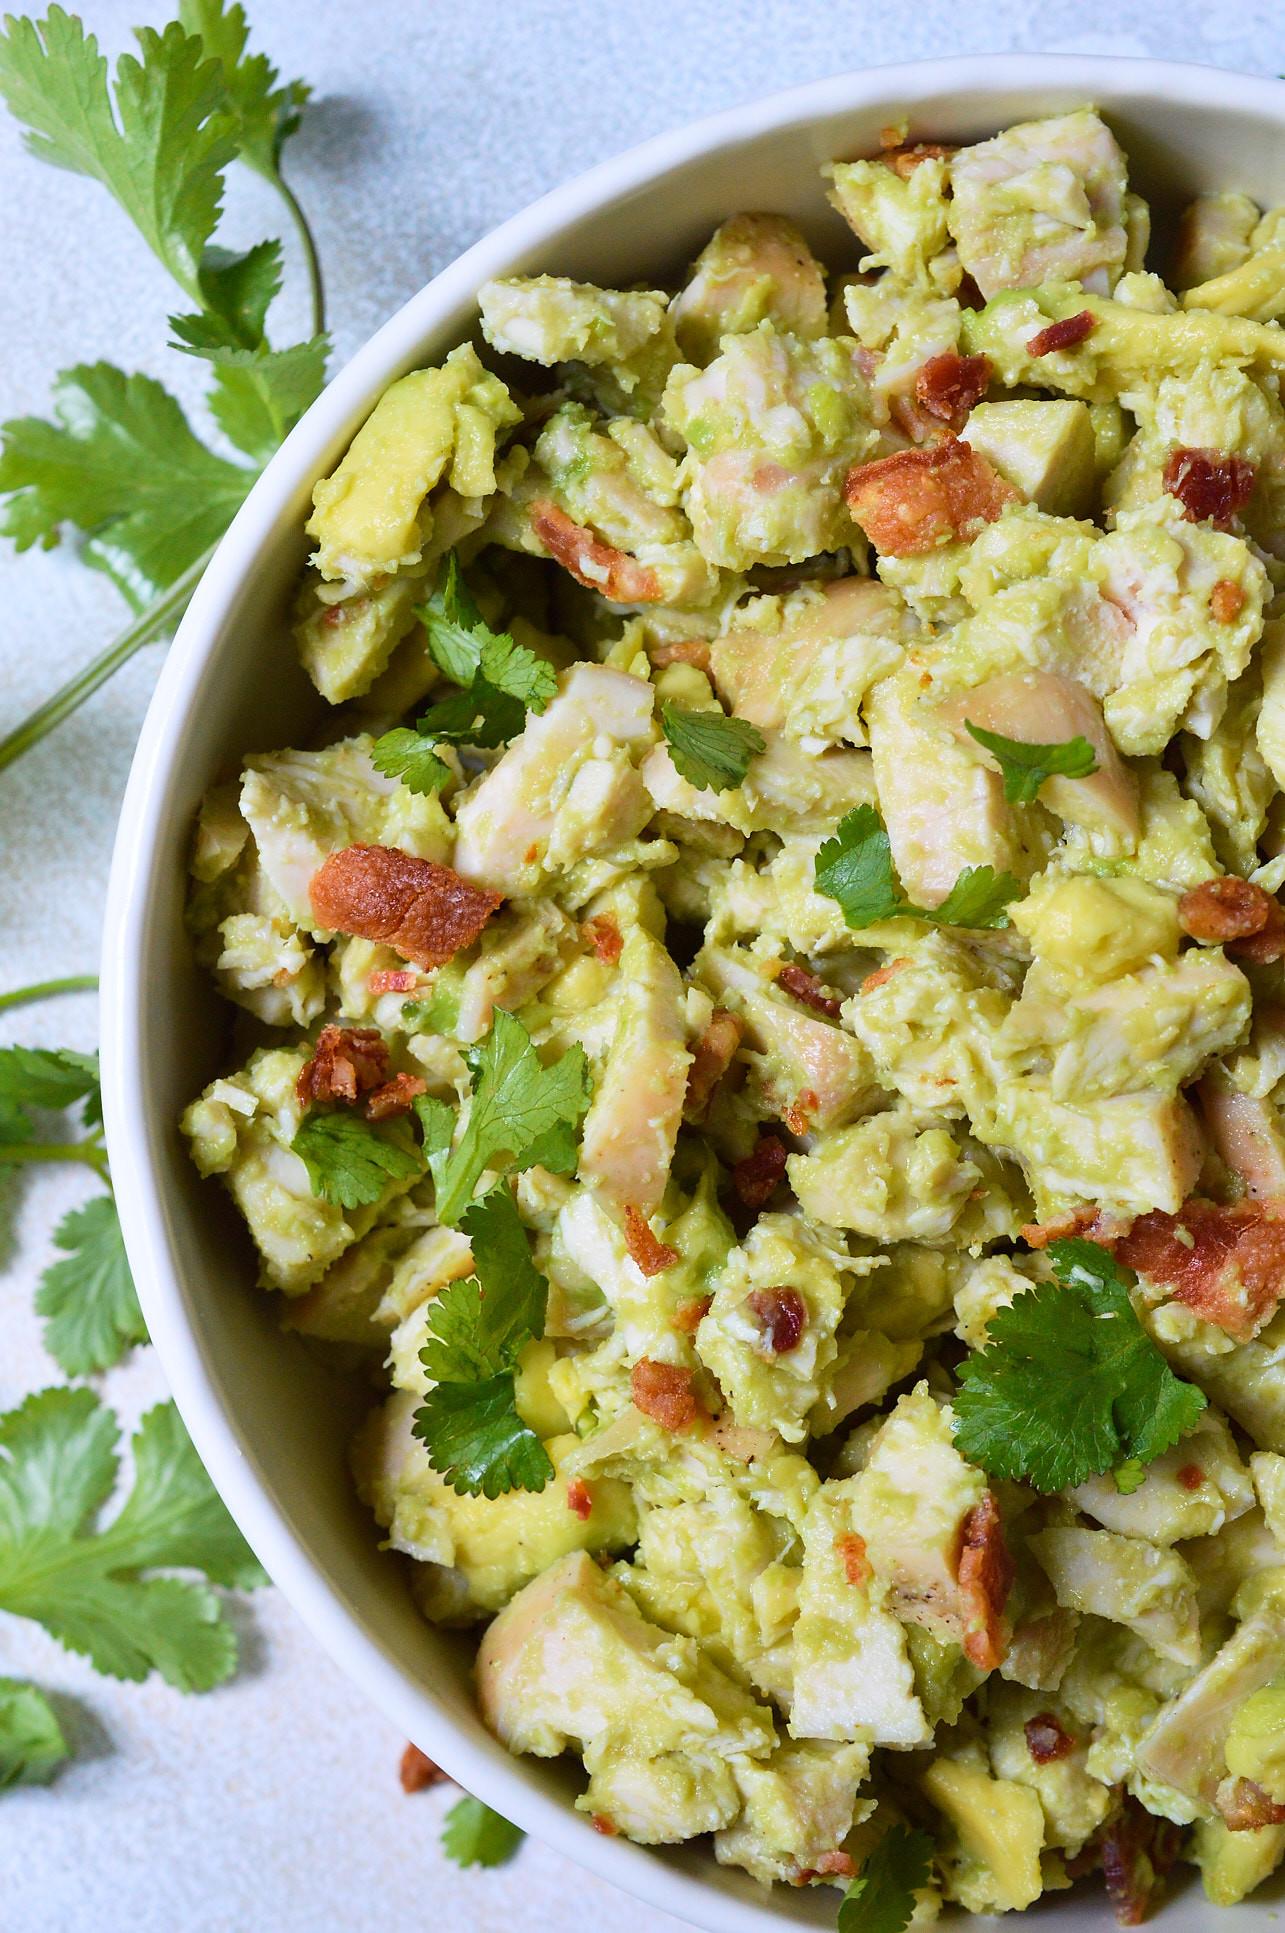 Healthy Avocado Recipes  Bacon Avocado Chicken Salad Whole30 Recipe WonkyWonderful